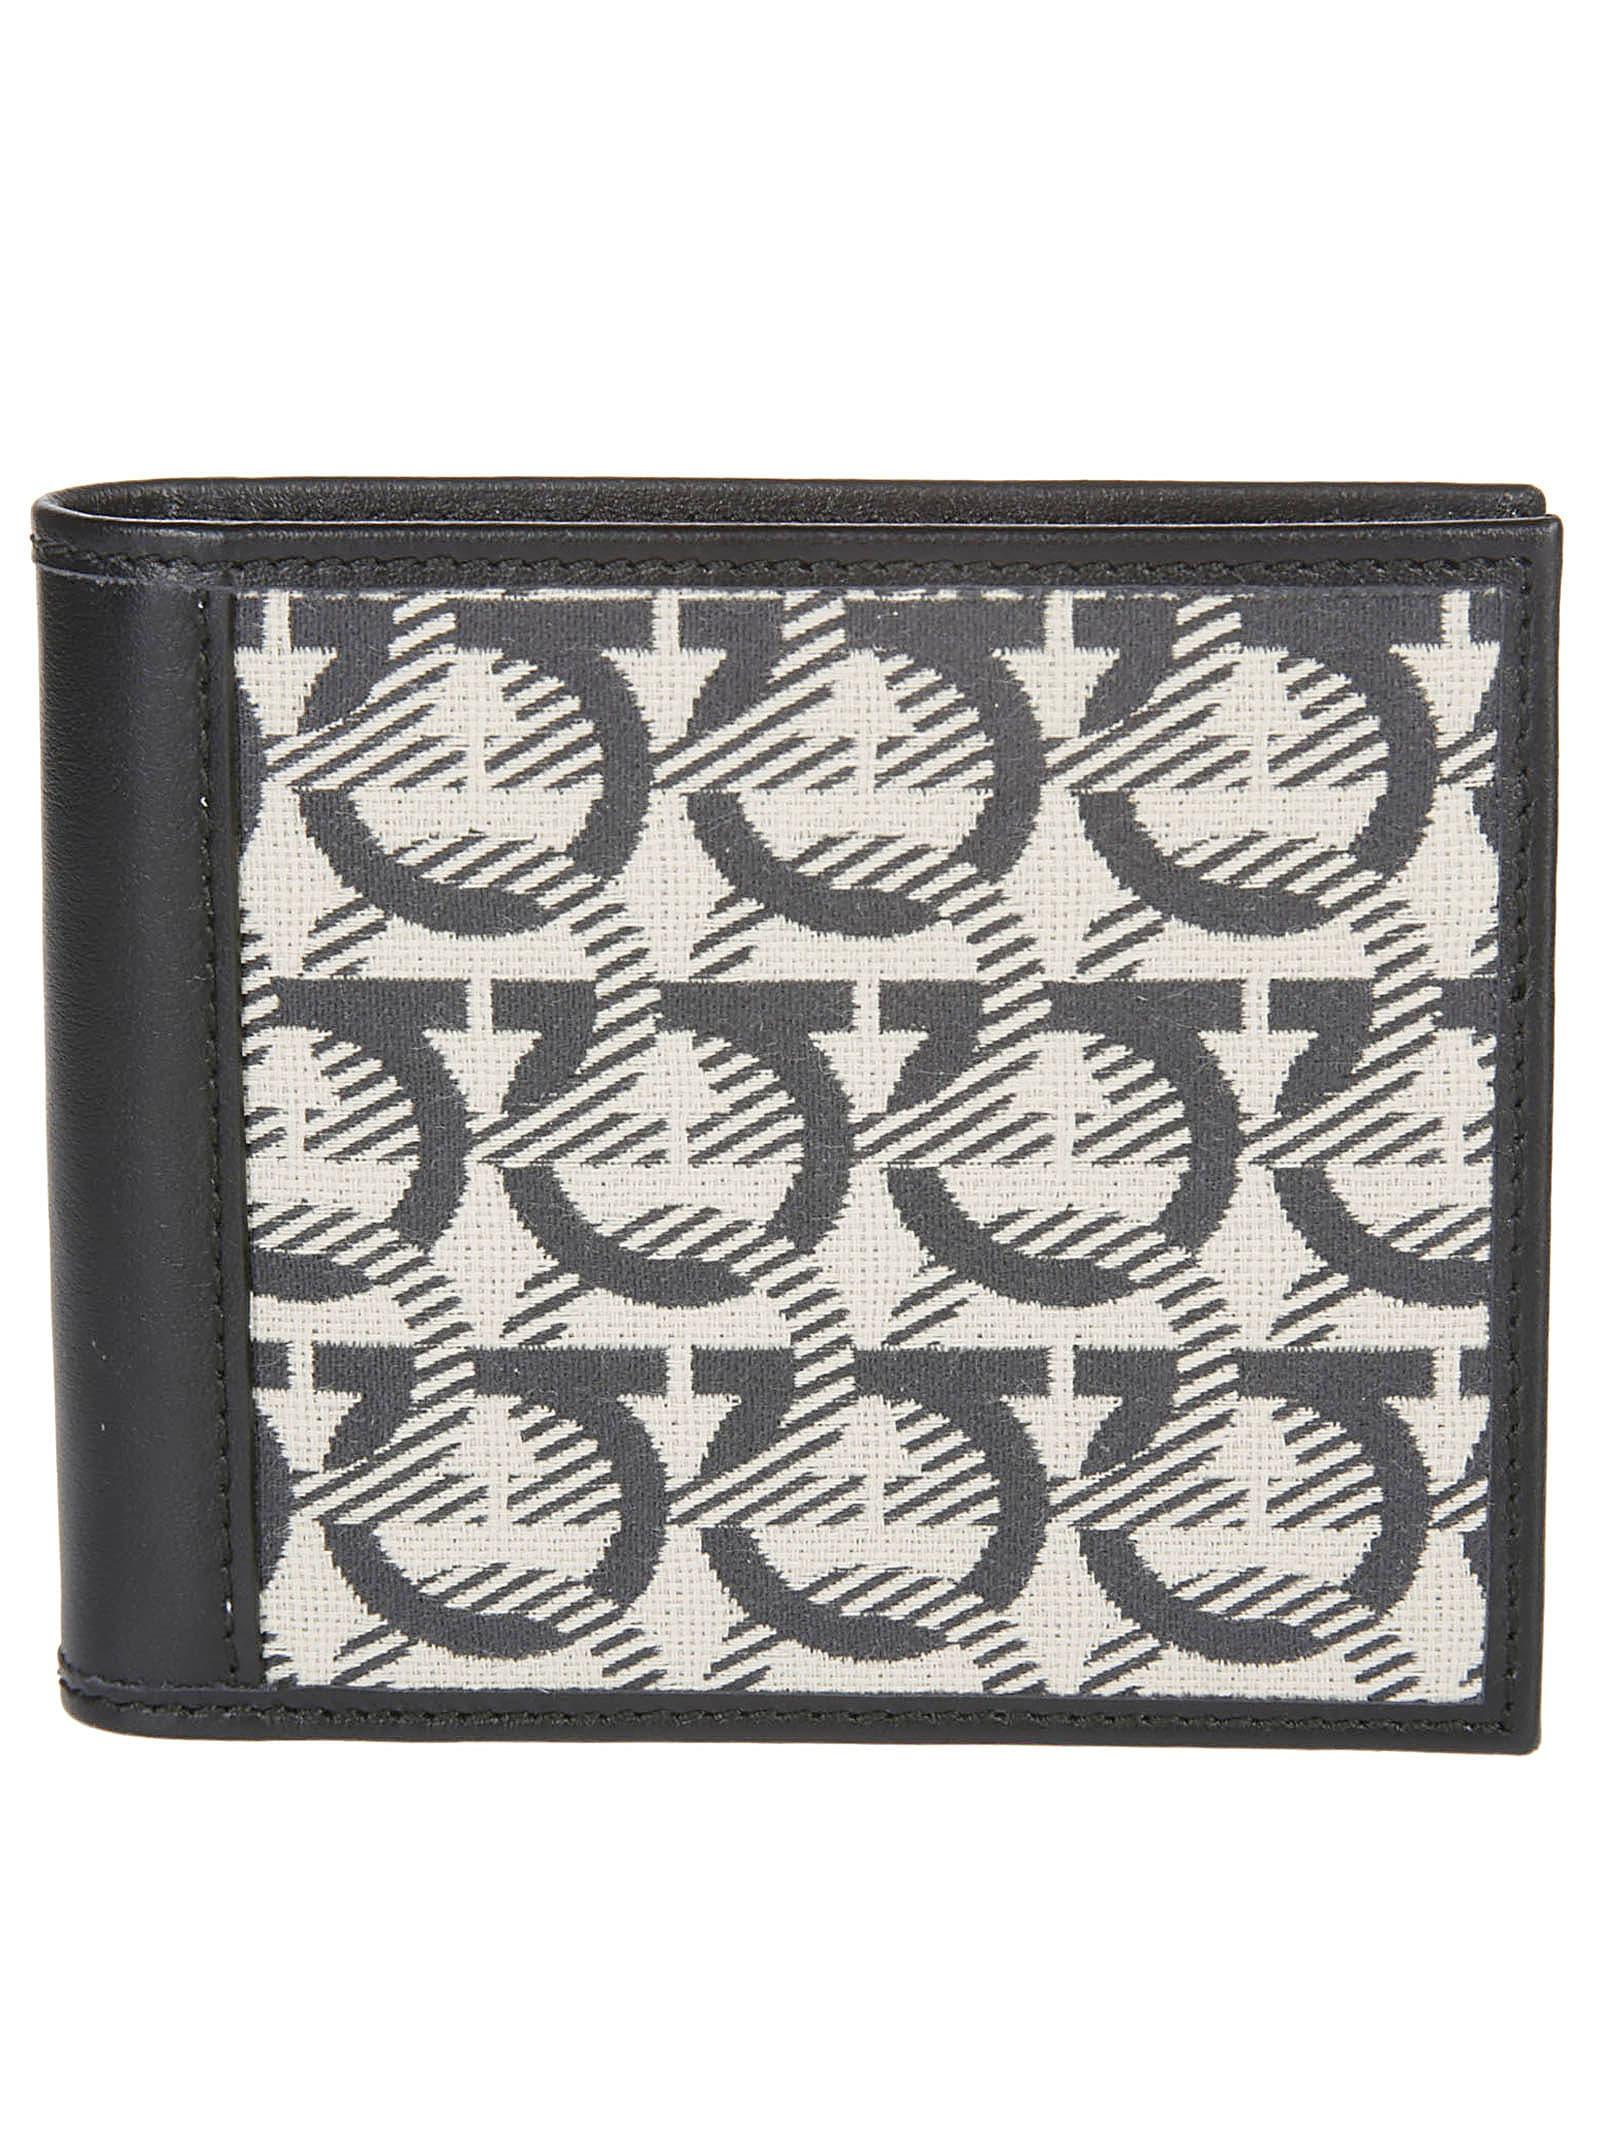 Salvatore Ferragamo Black Leather And Beige Cotton Gancini Wallet